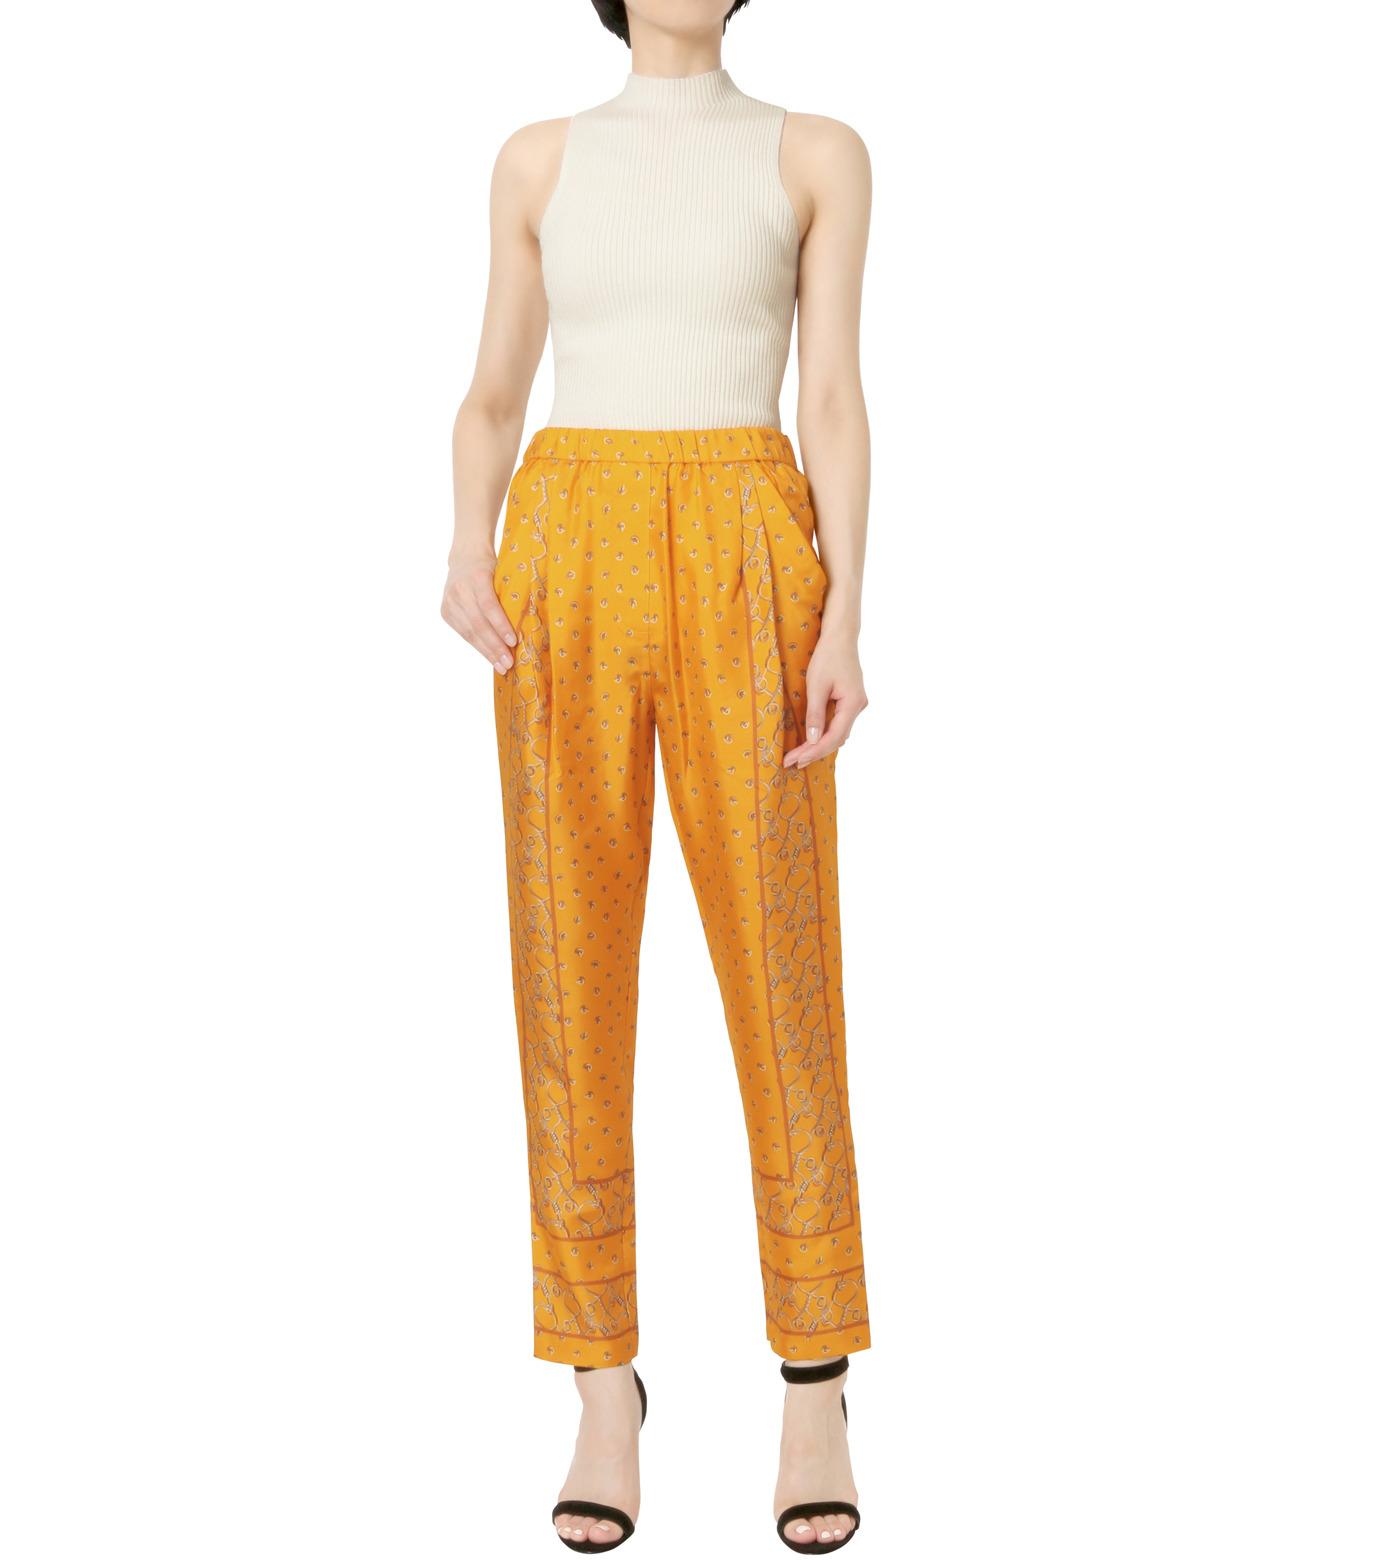 3.1 Phillip Lim(スリーワン フィリップリム)のScarf Print Tapered Trouser-YELLOW(パンツ/pants)-P161-5447BKP-32 拡大詳細画像3